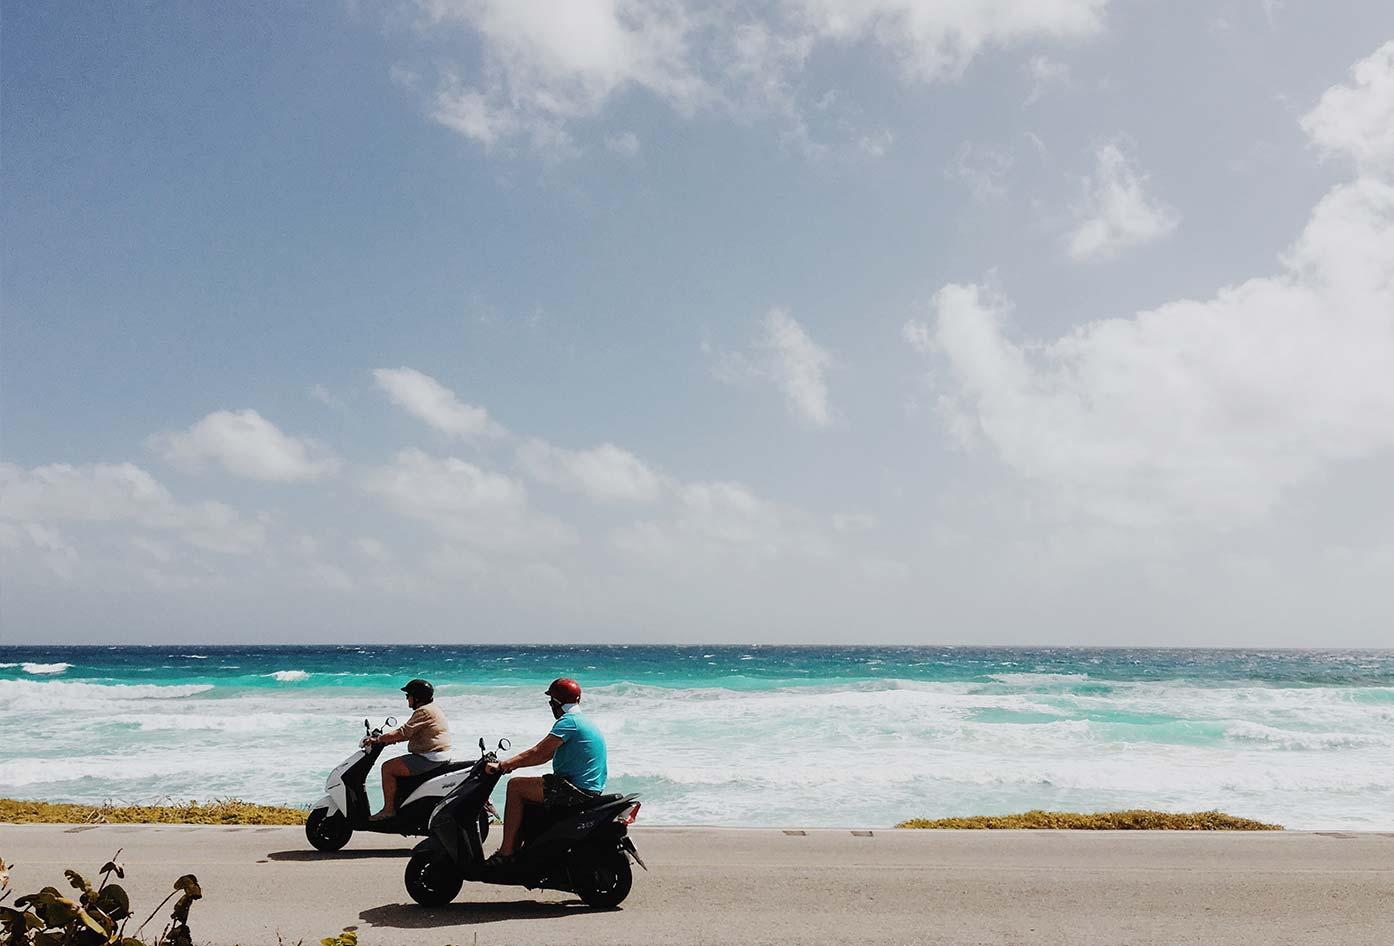 cozumel and cancun comparison